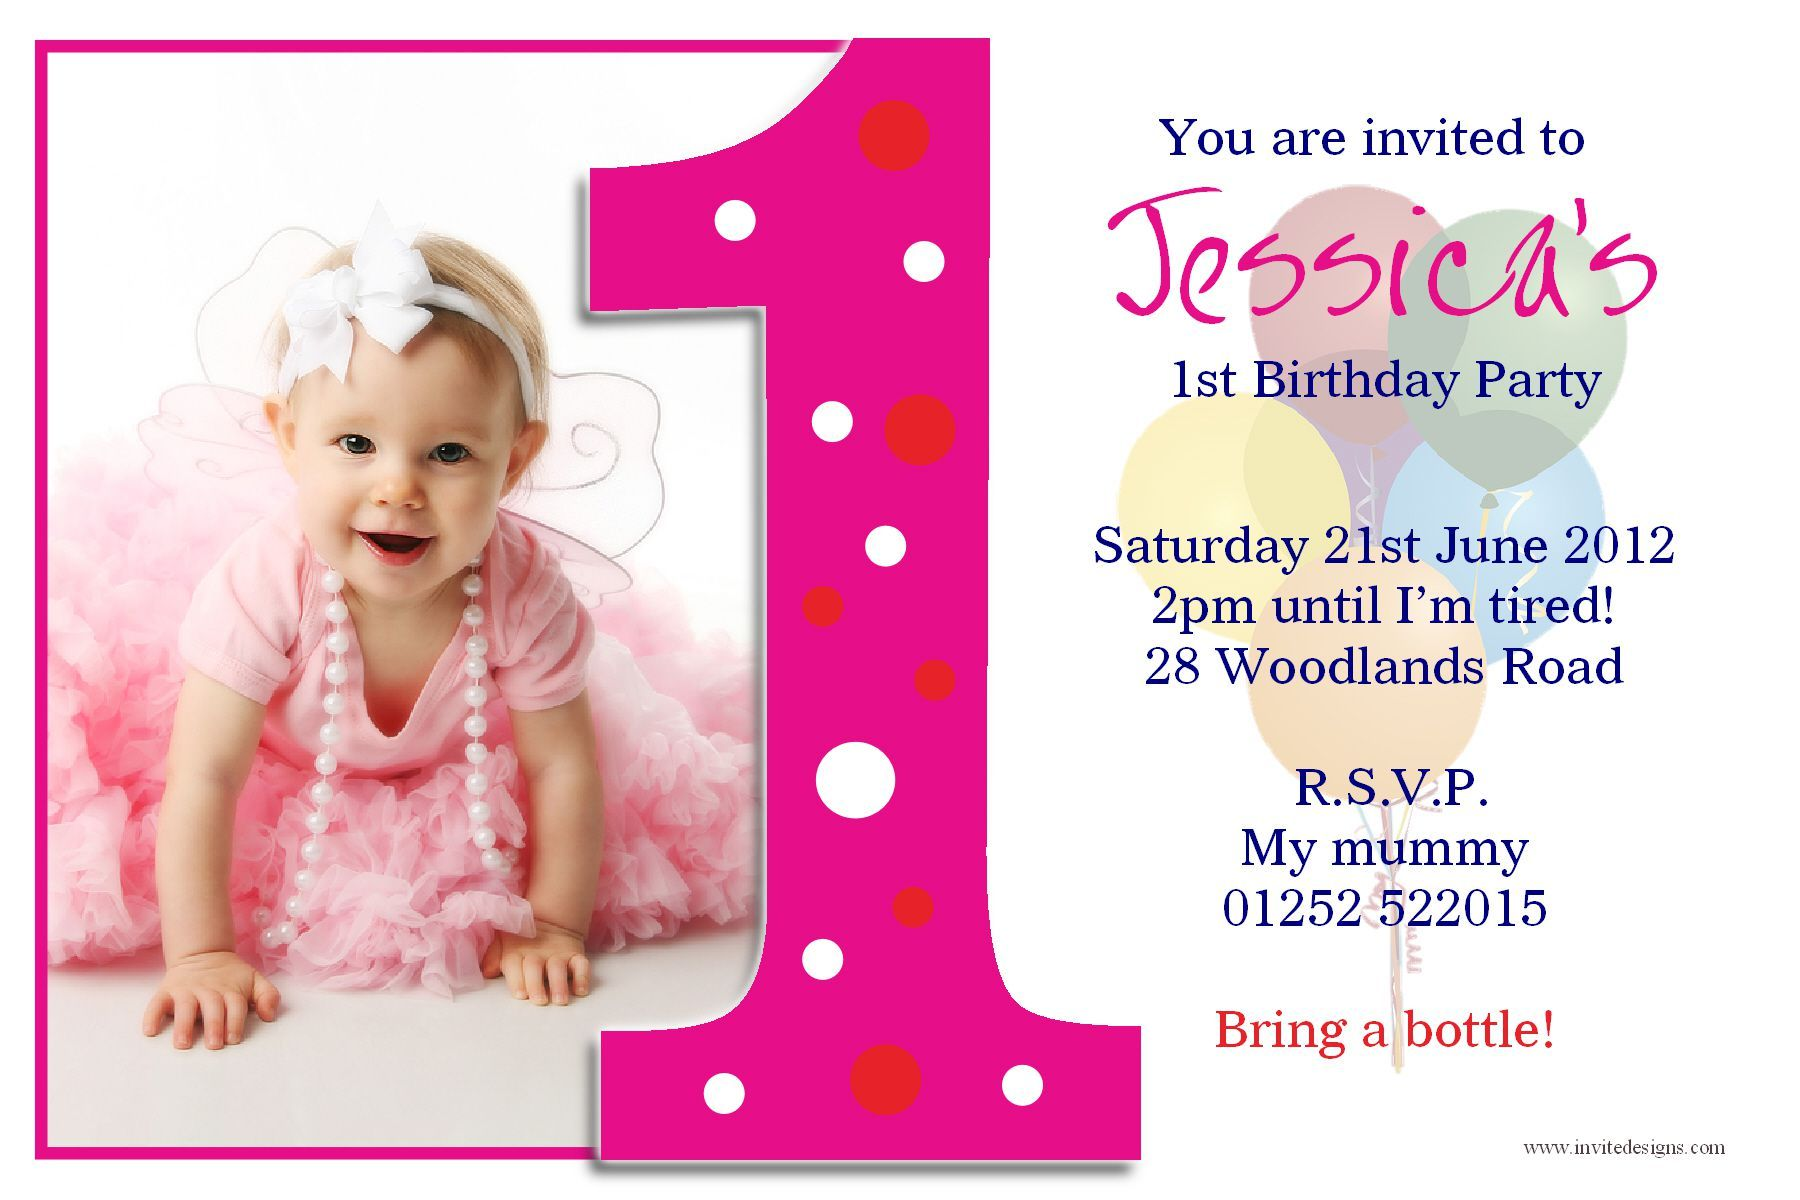 Birthday party first birthday invitations card invitation birthday party first birthday invitations card invitation bookmarktalkfo Images